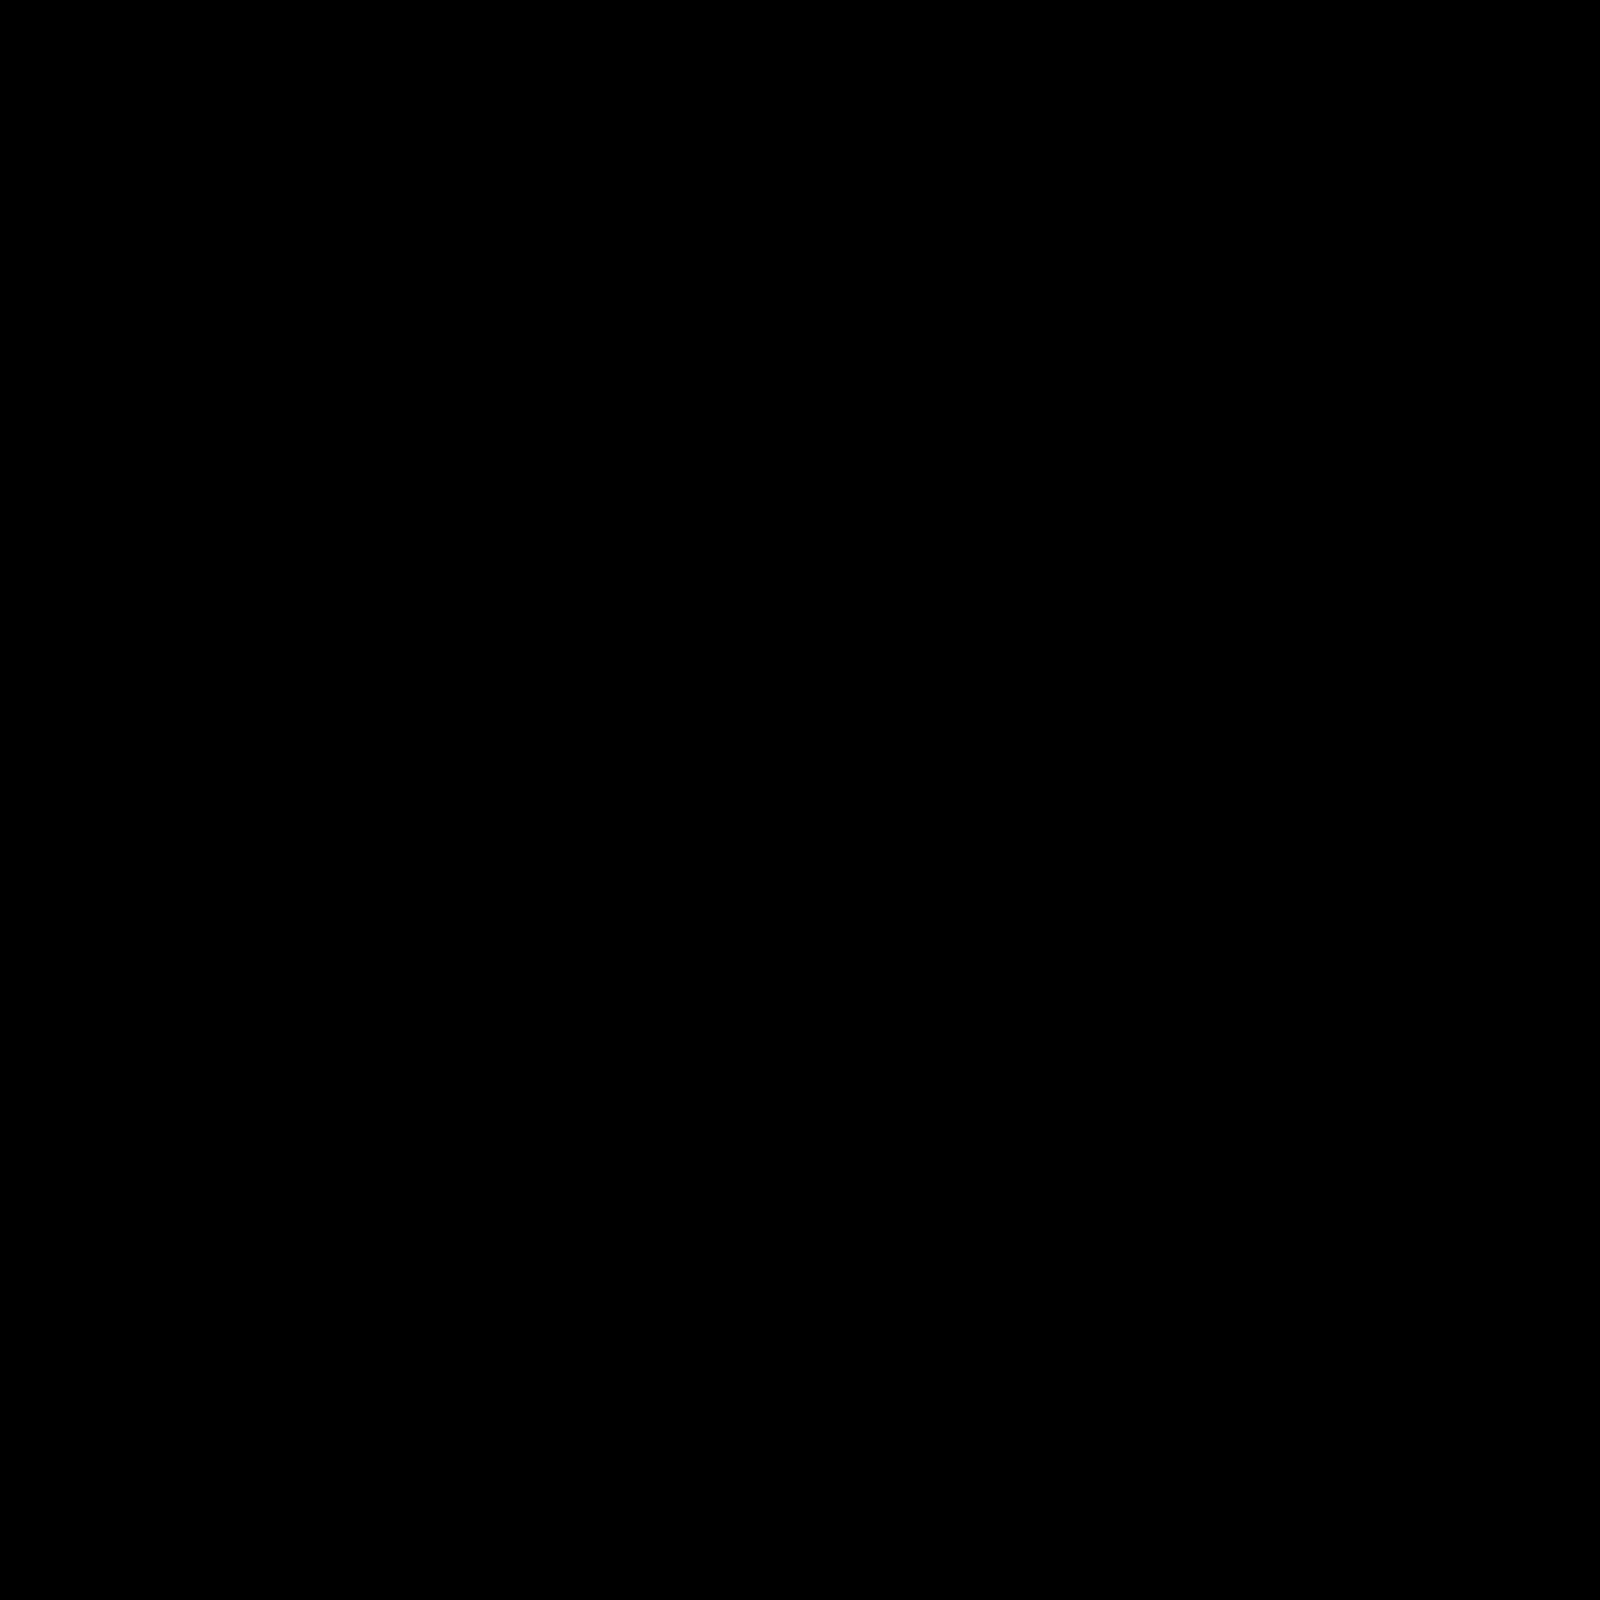 Символ луны icon